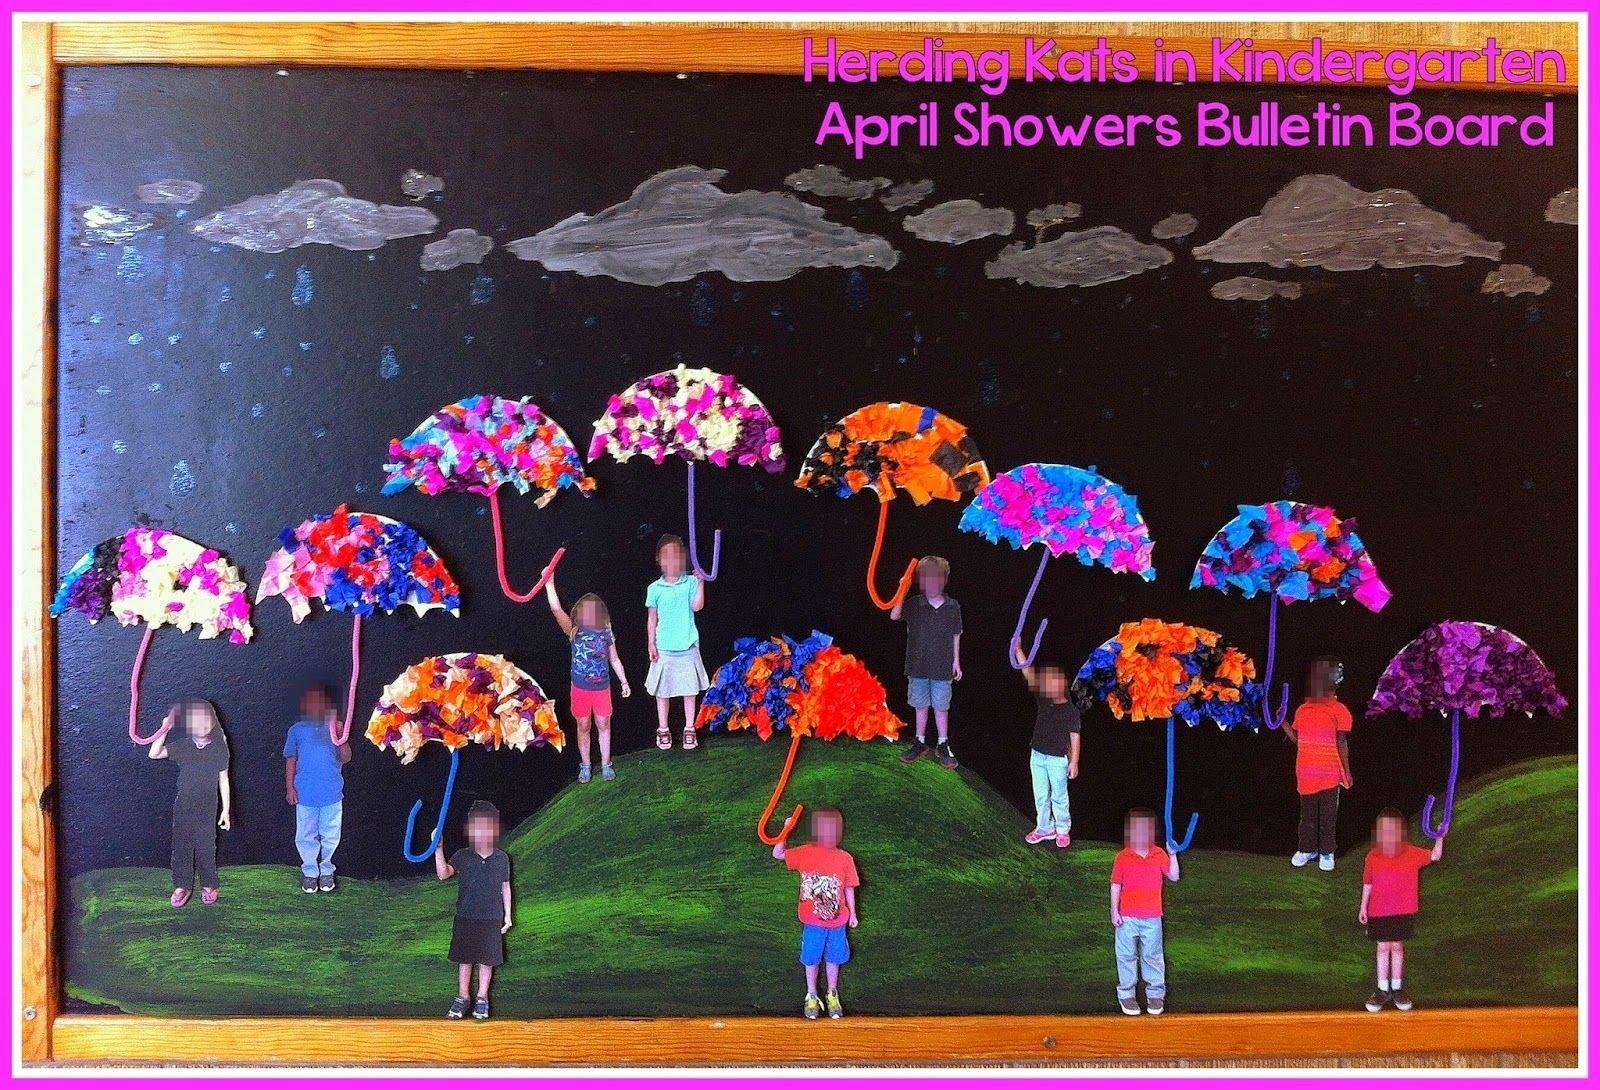 10 Attractive April Showers Bulletin Board Ideas april showers bulletin board kindergartenklub pinterest 2021